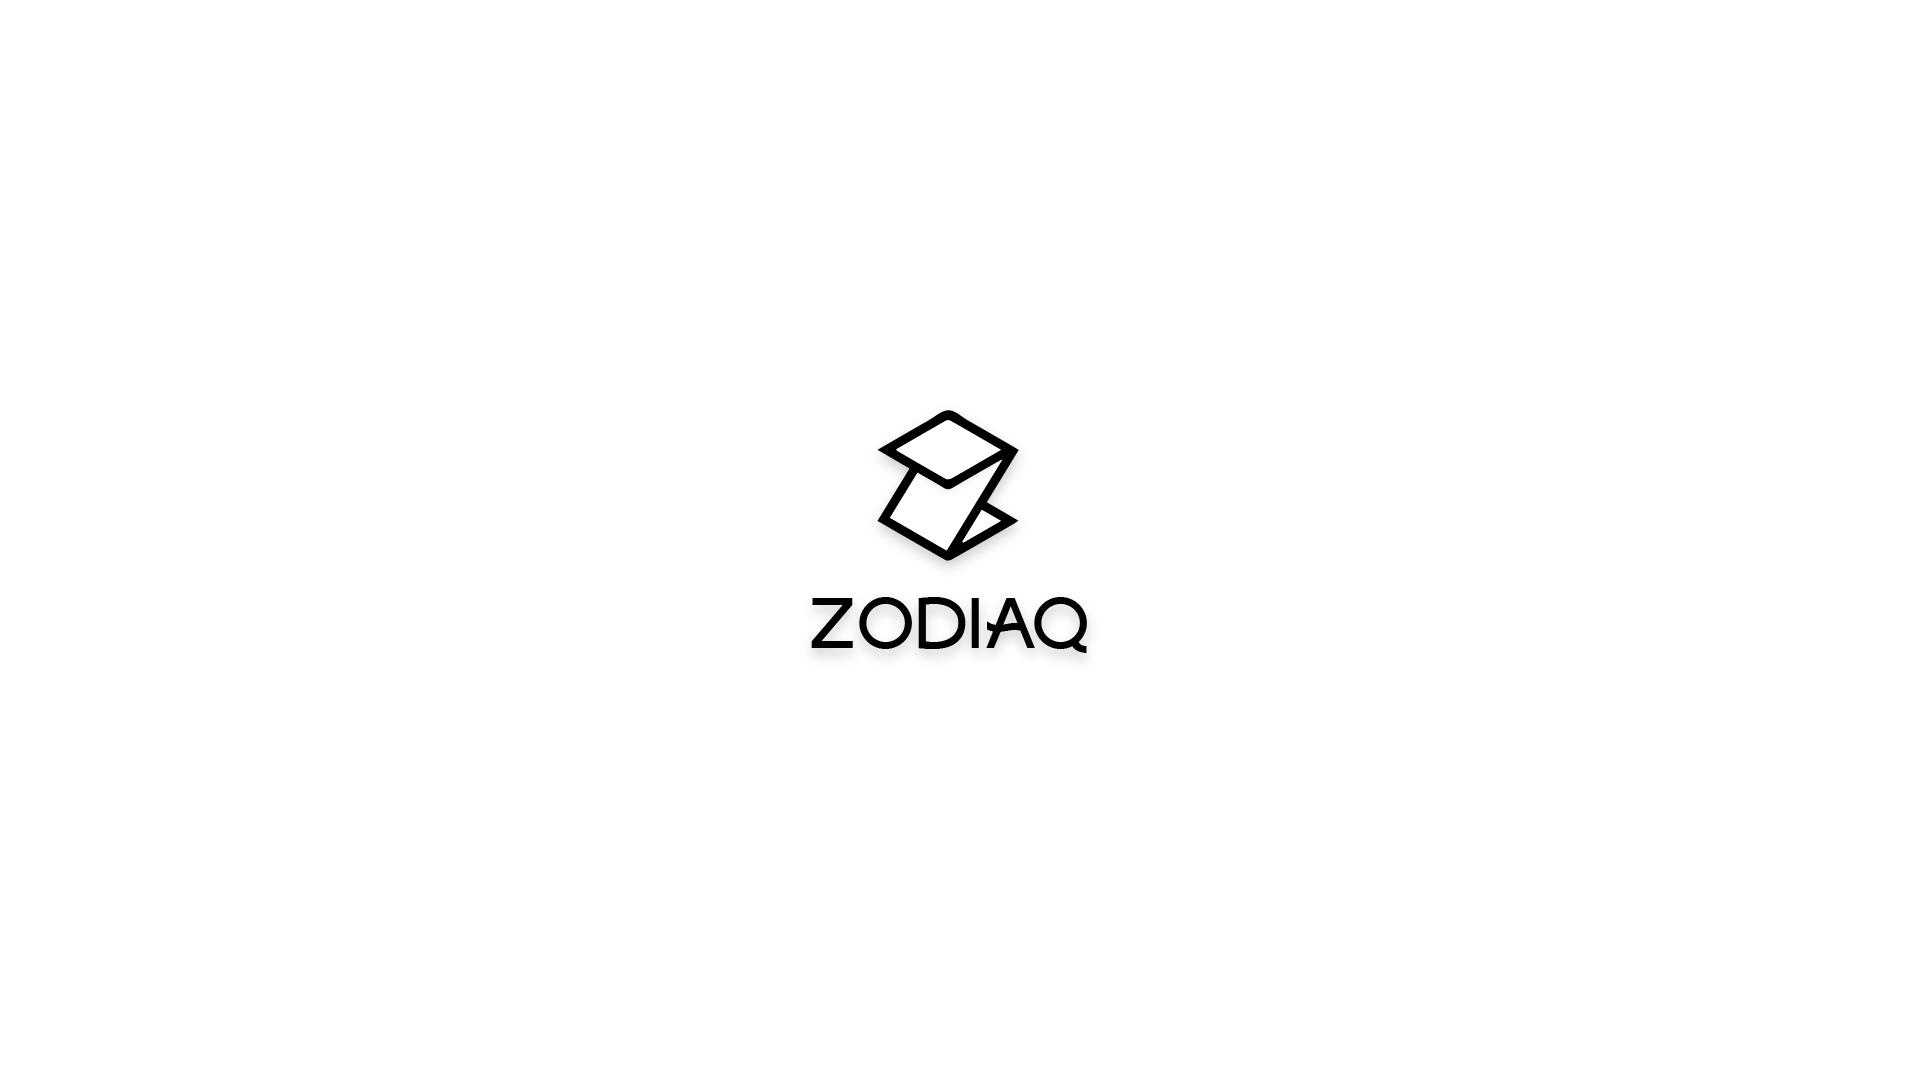 Разработка логотипа и основных элементов стиля фото f_24359902afc73e44.png